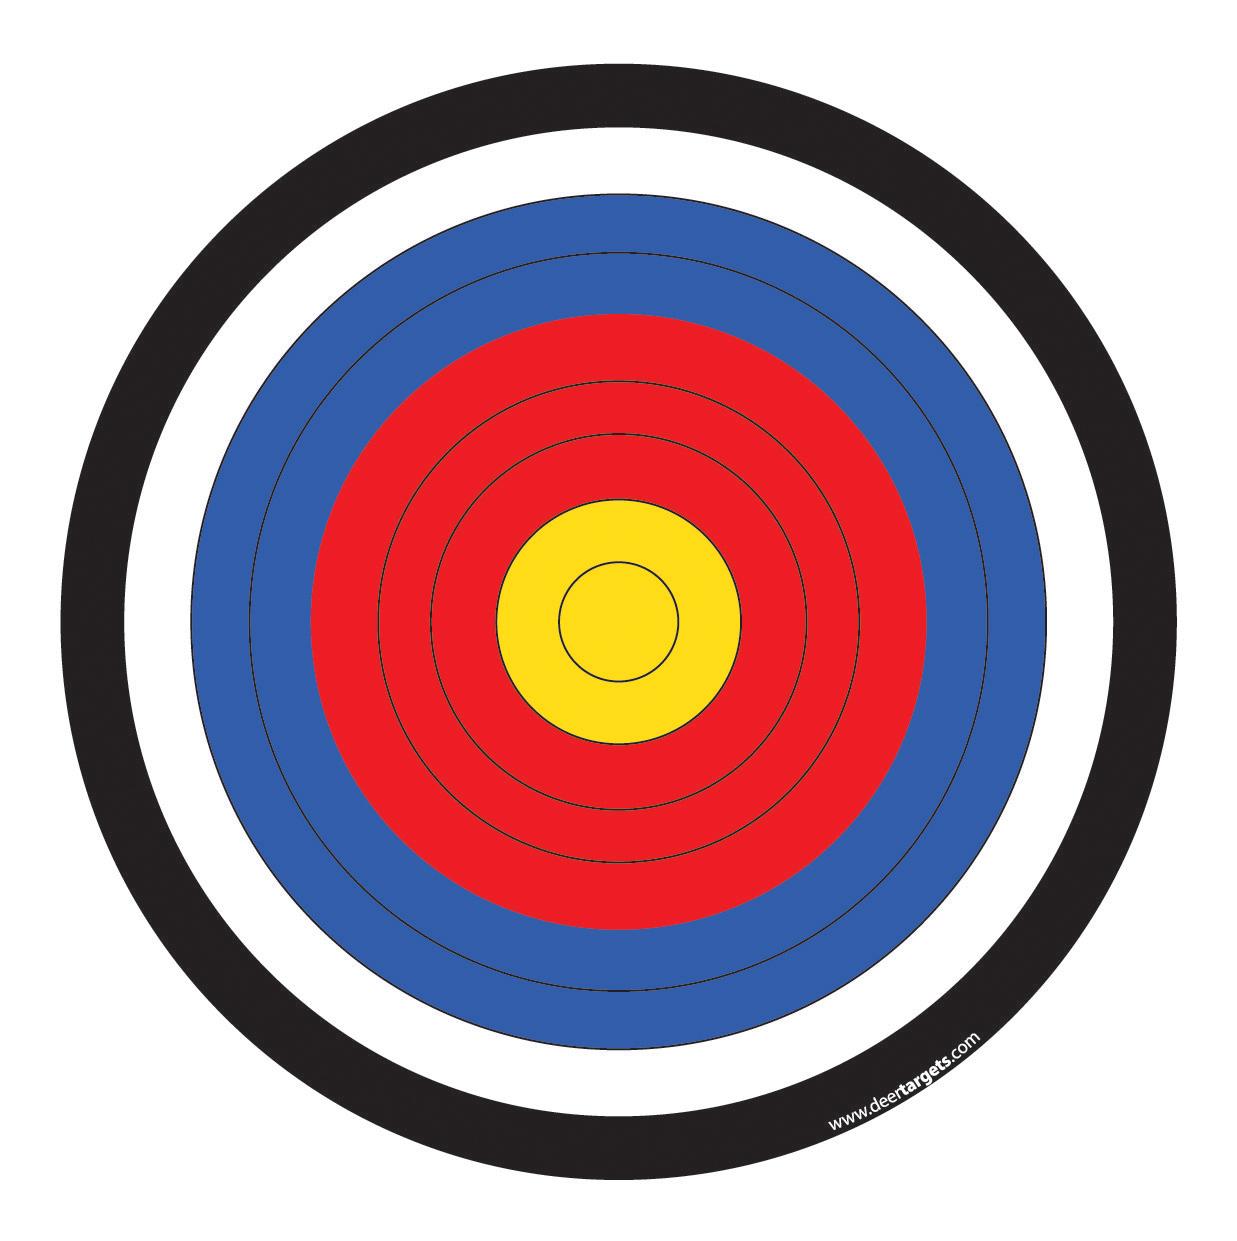 Free Archery Bullseye Cliparts, Download Free Clip Art, Free.